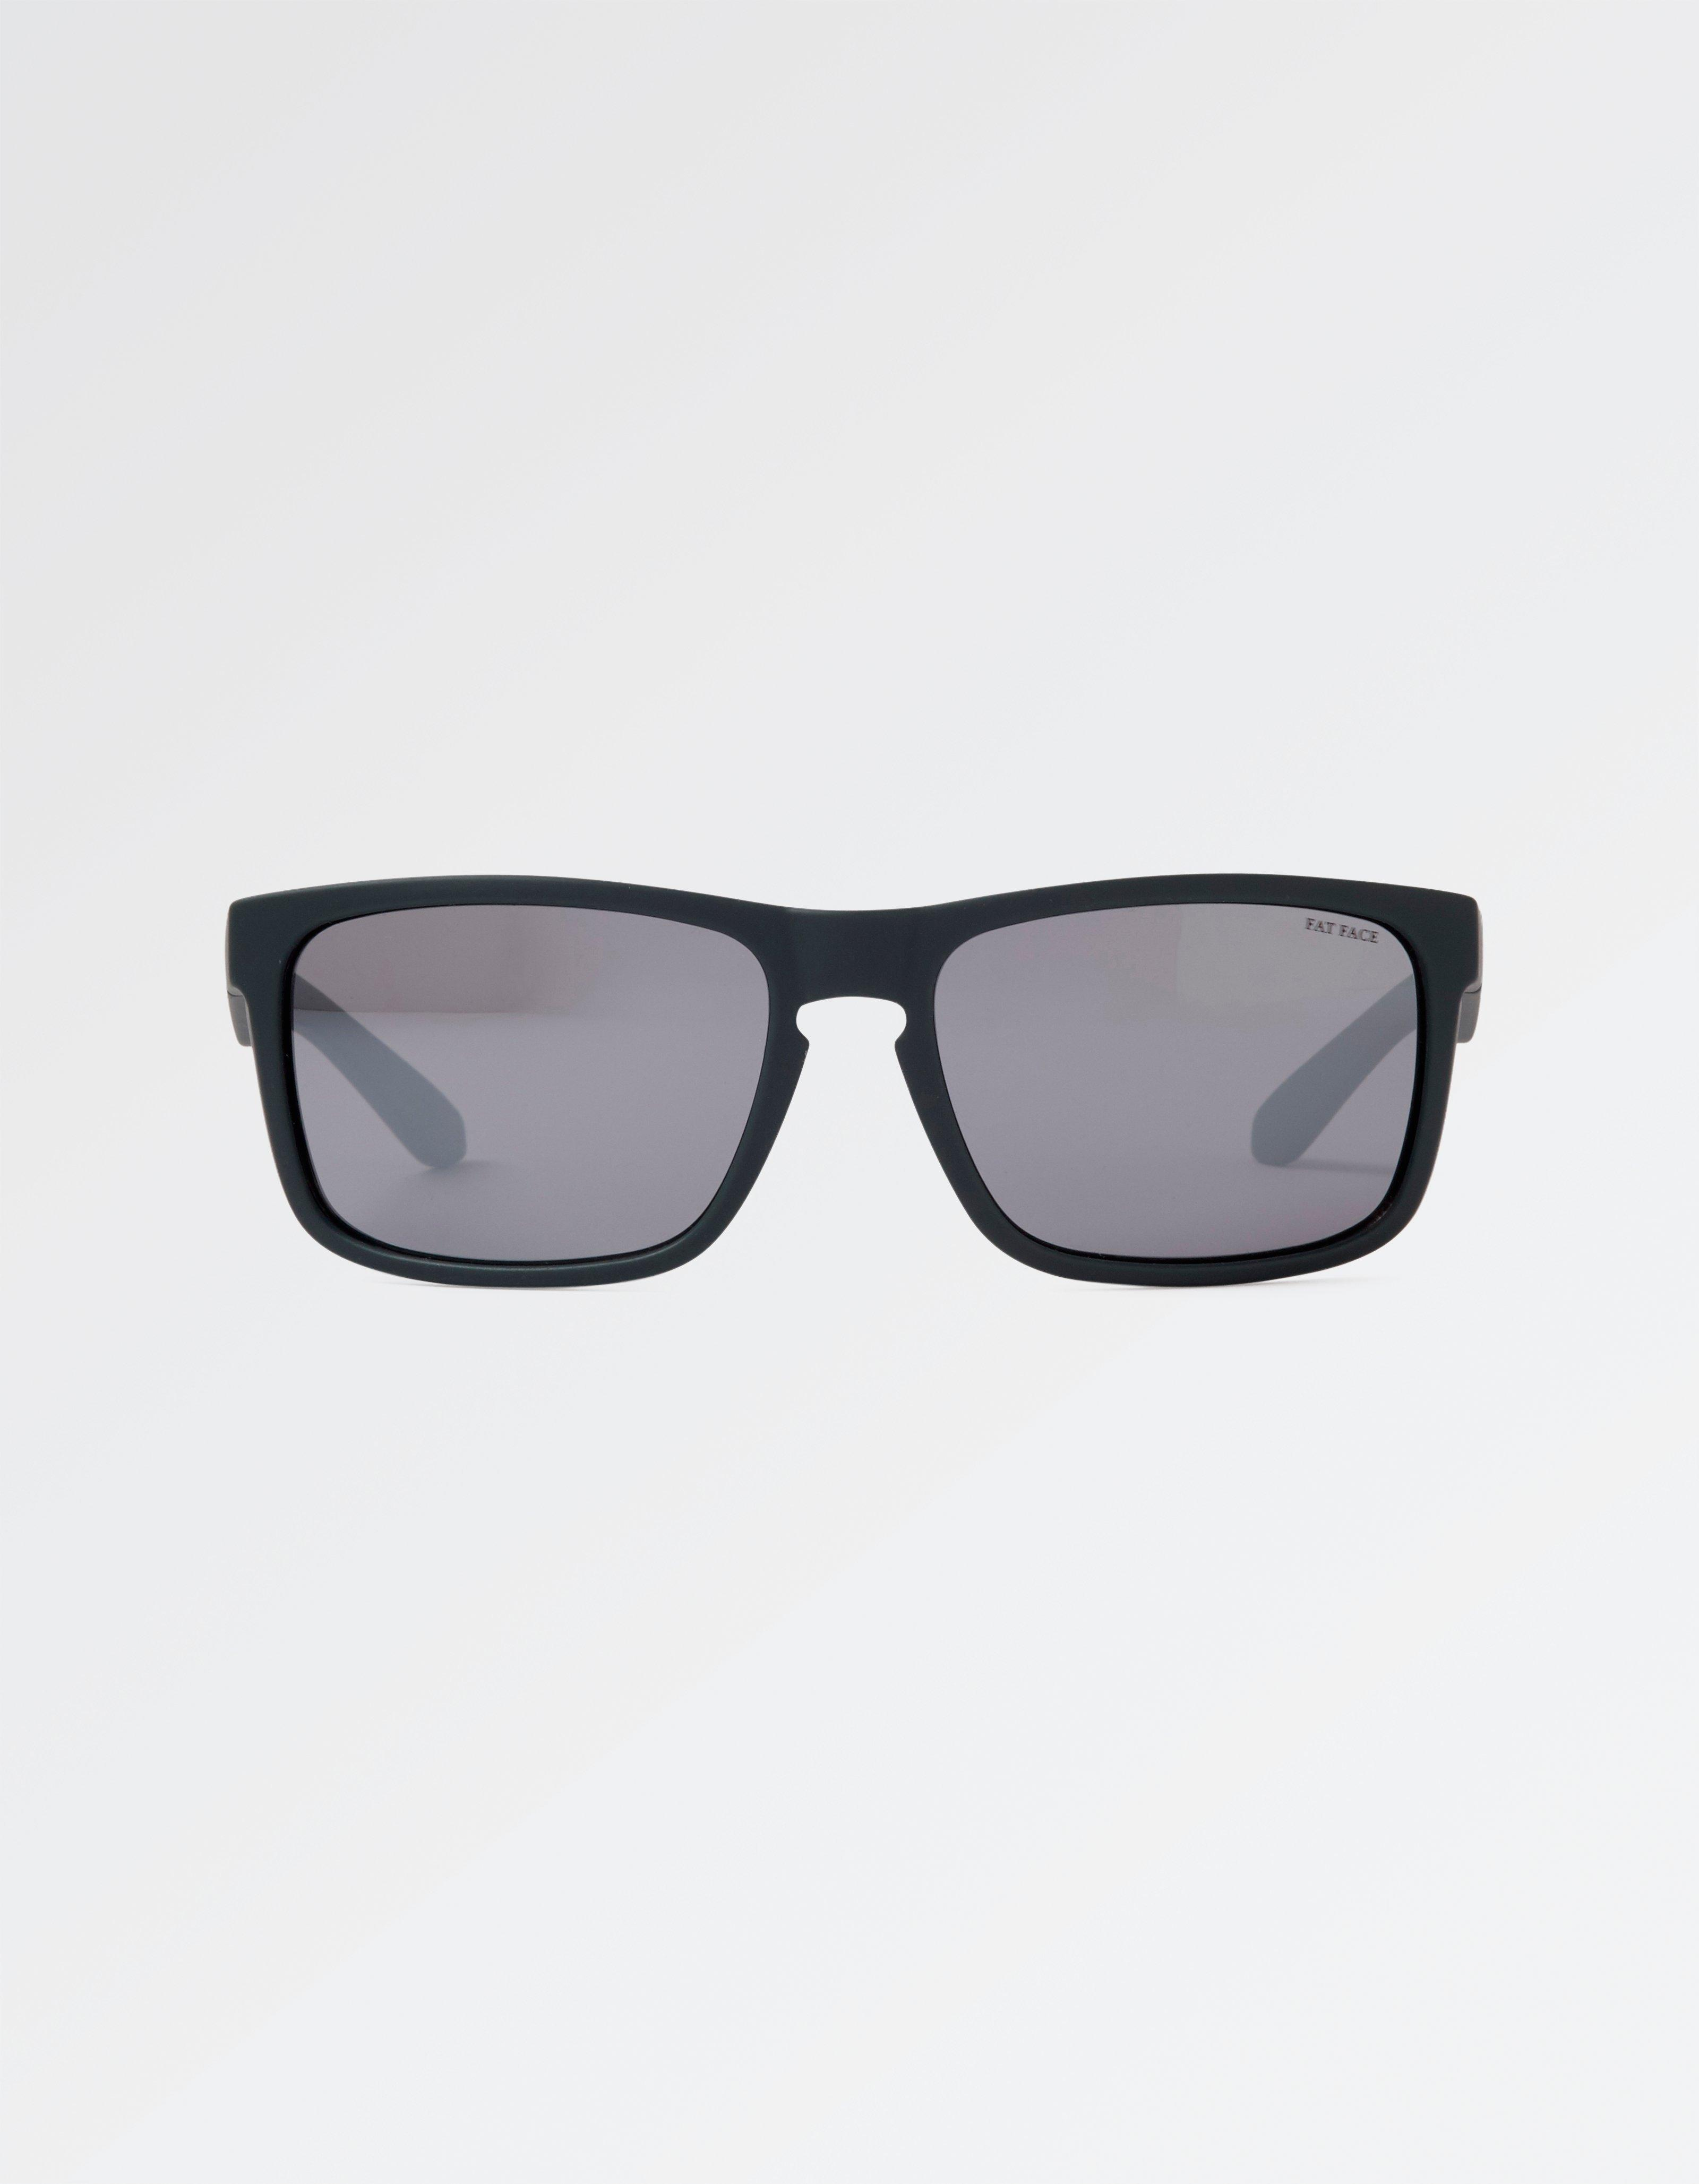 Nick Mirrored Lens Sunglasses